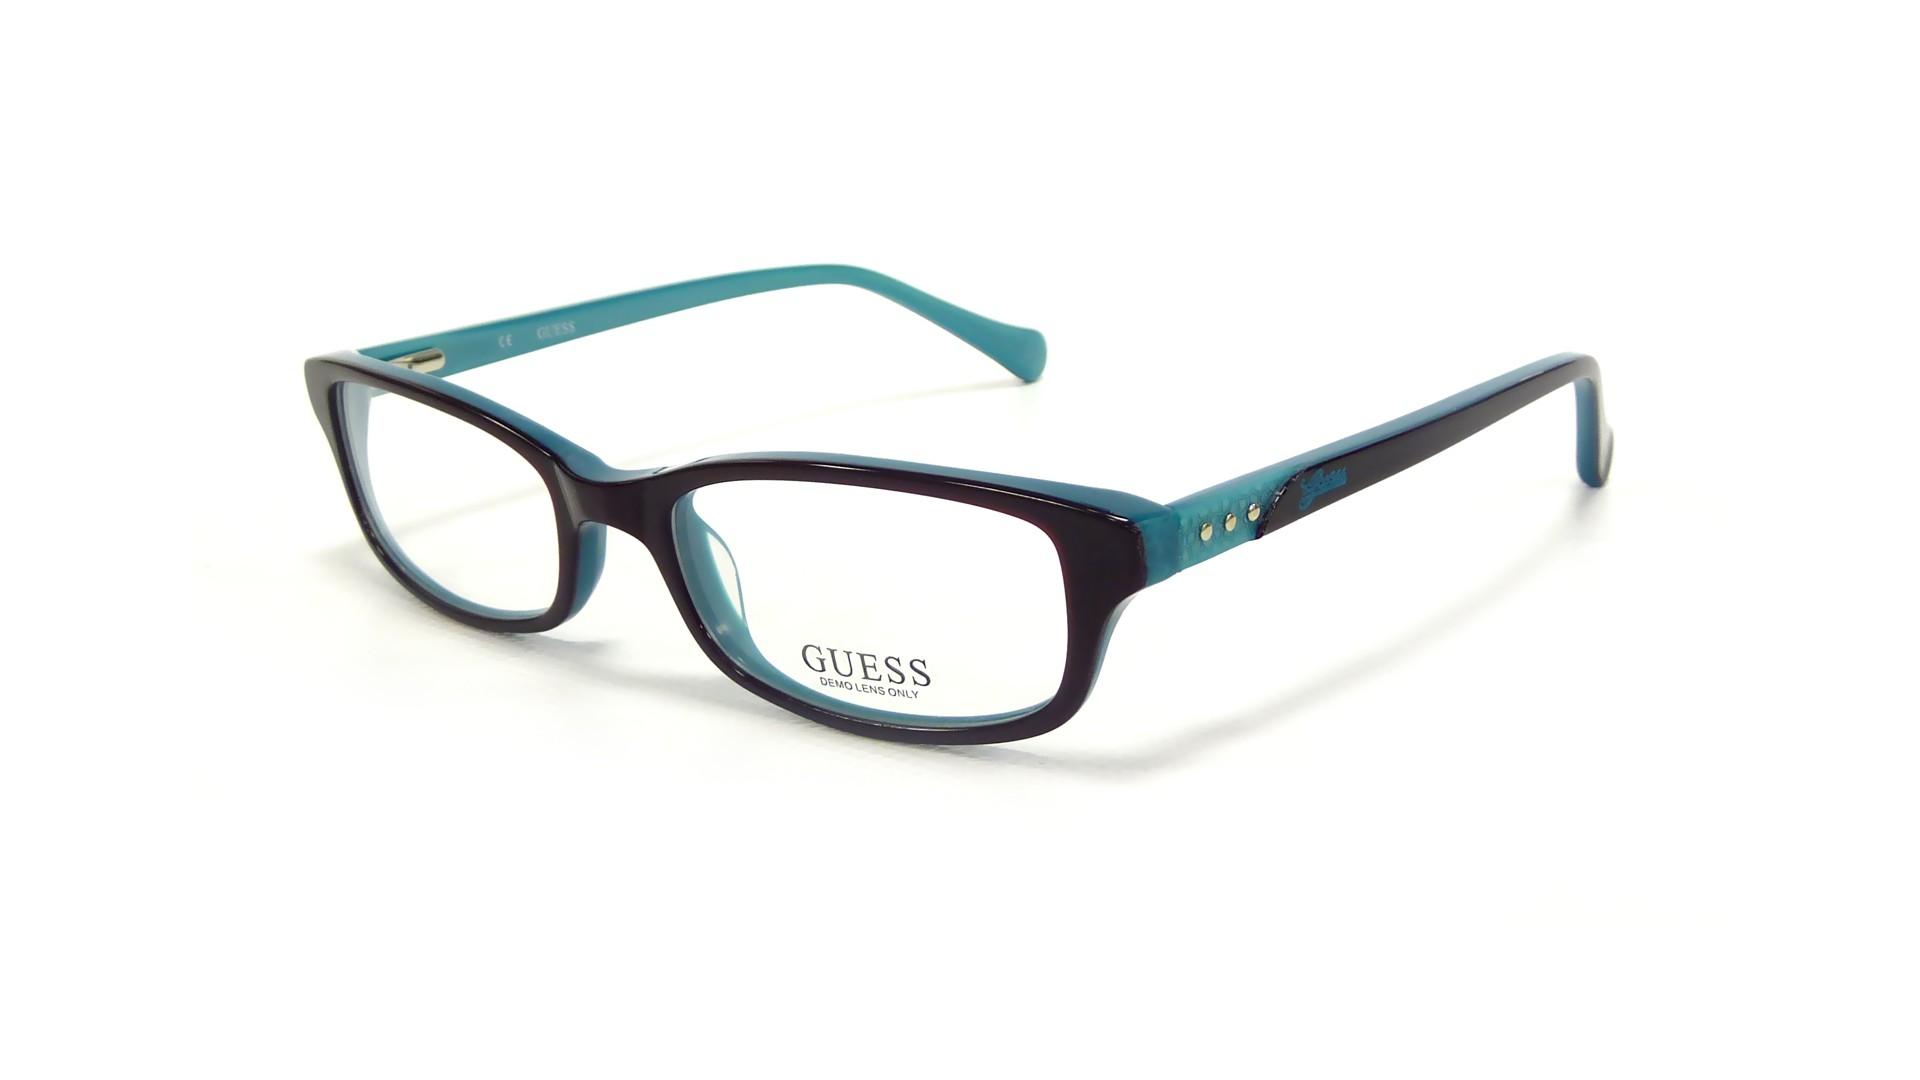 Guess Prescription Eyeglasses  Quality Frames by Geuss